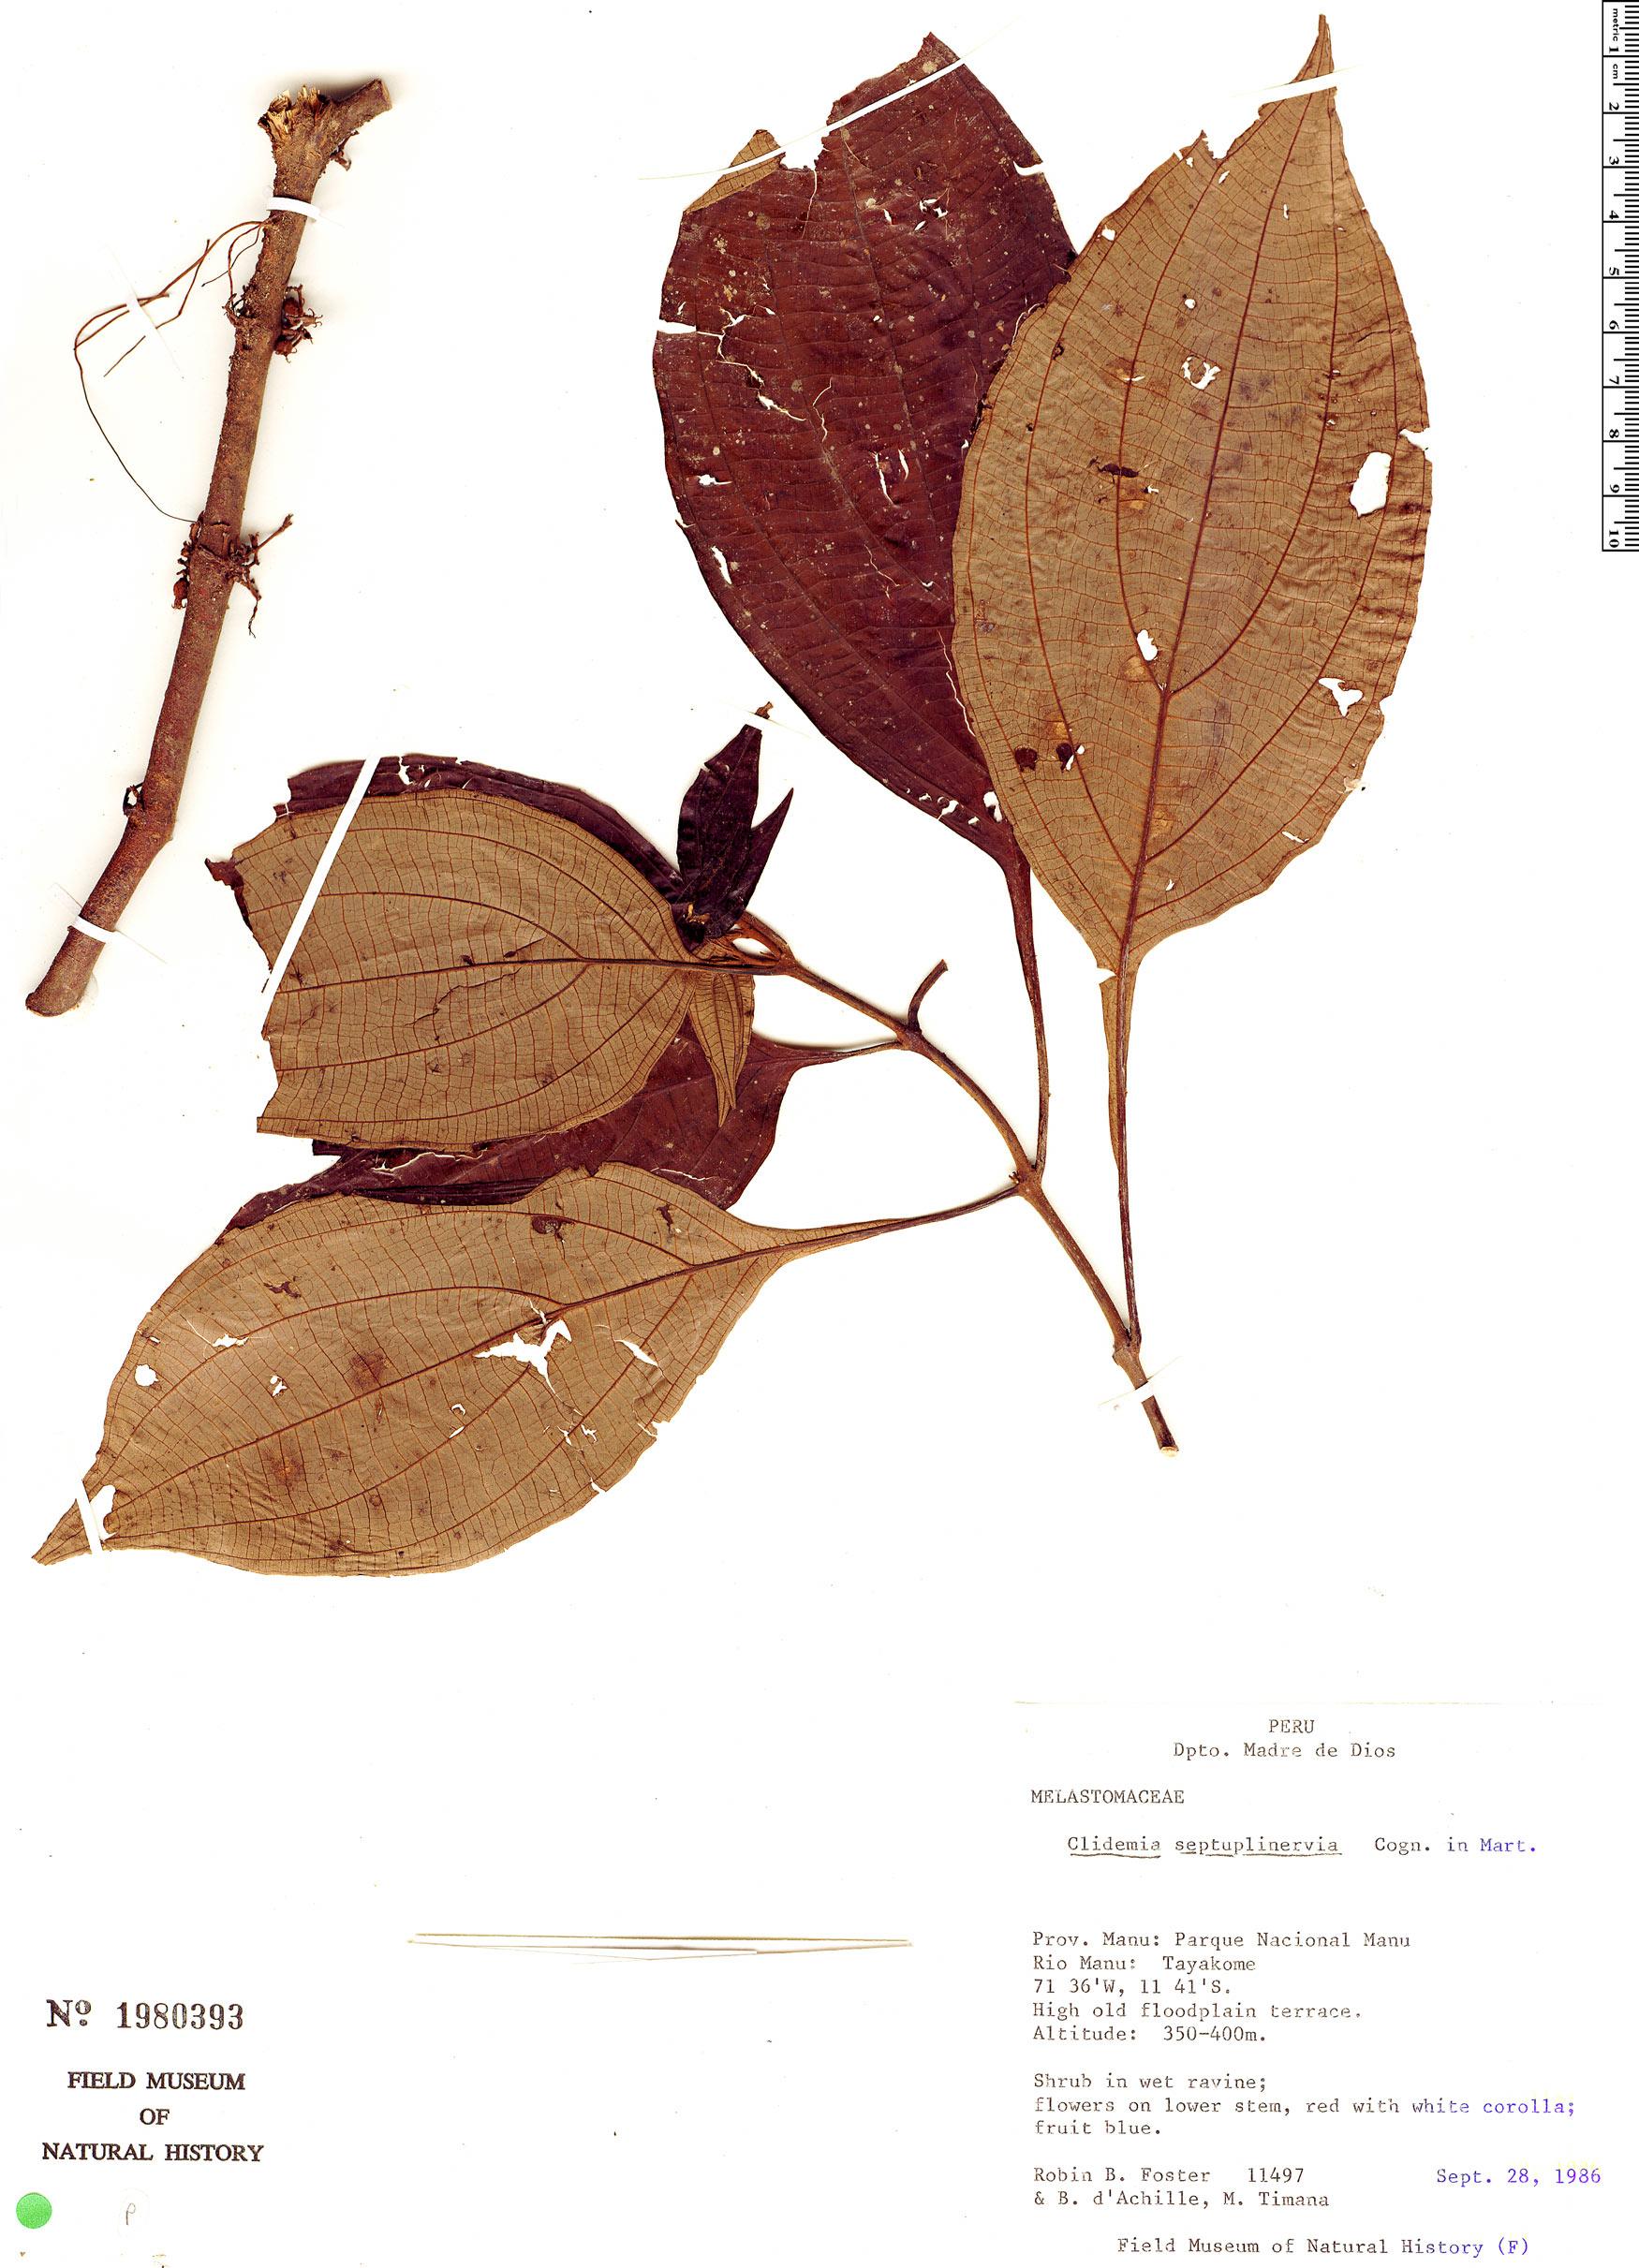 Specimen: Clidemia septuplinervia